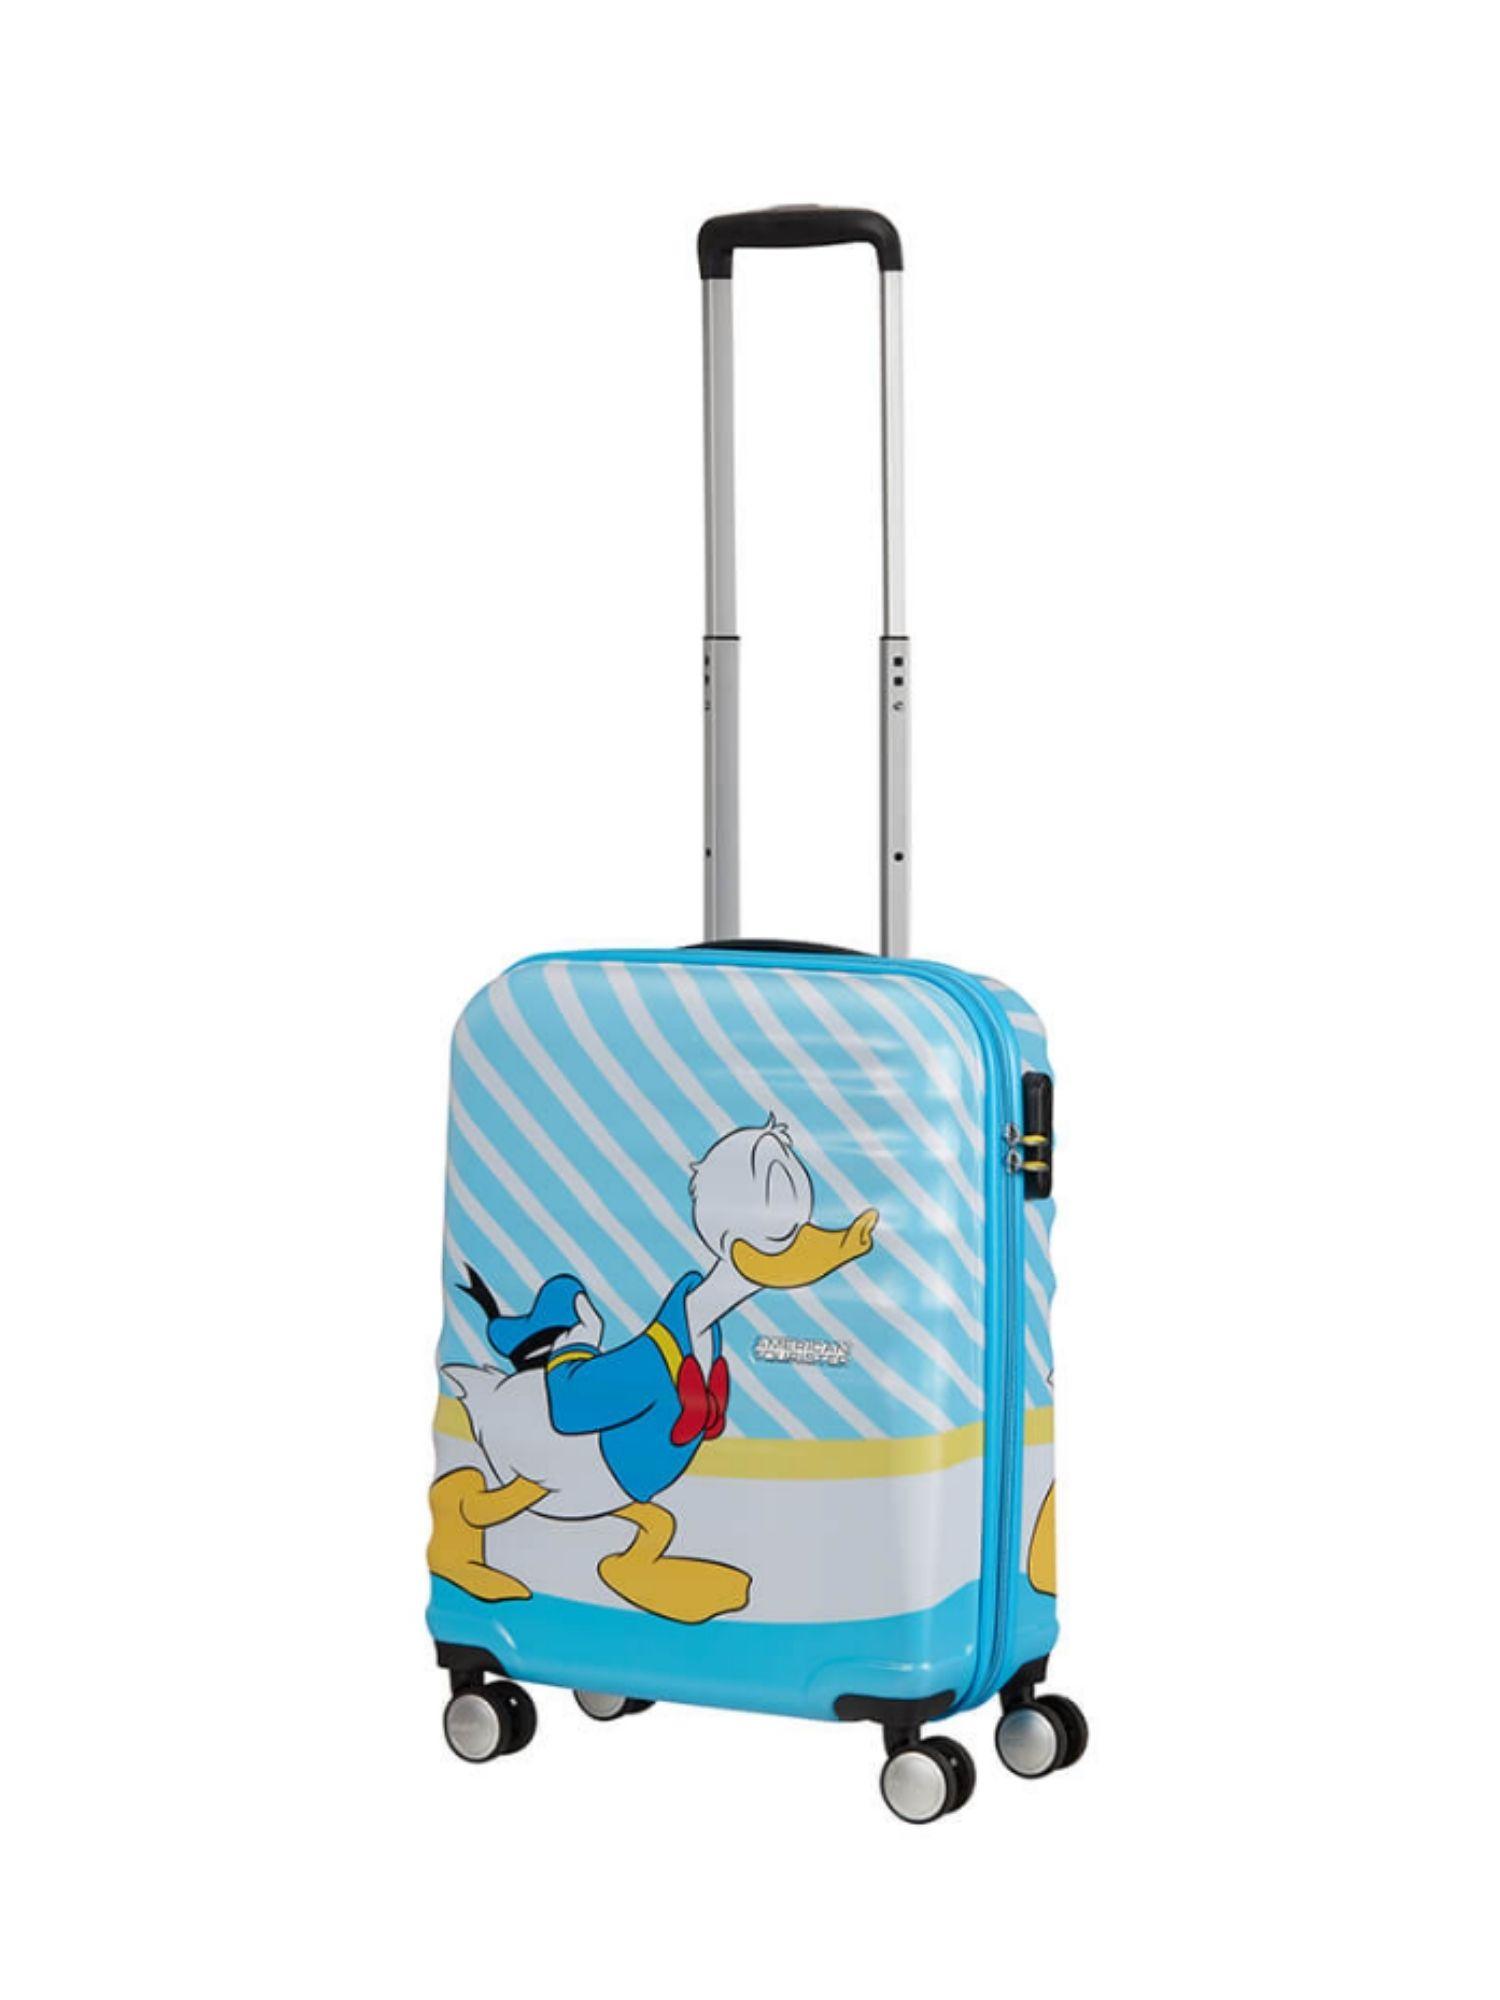 Trolley American Tourister 4 ruote 55 cm. Wavebreaker Disney Donald Blue Kiss dettagli